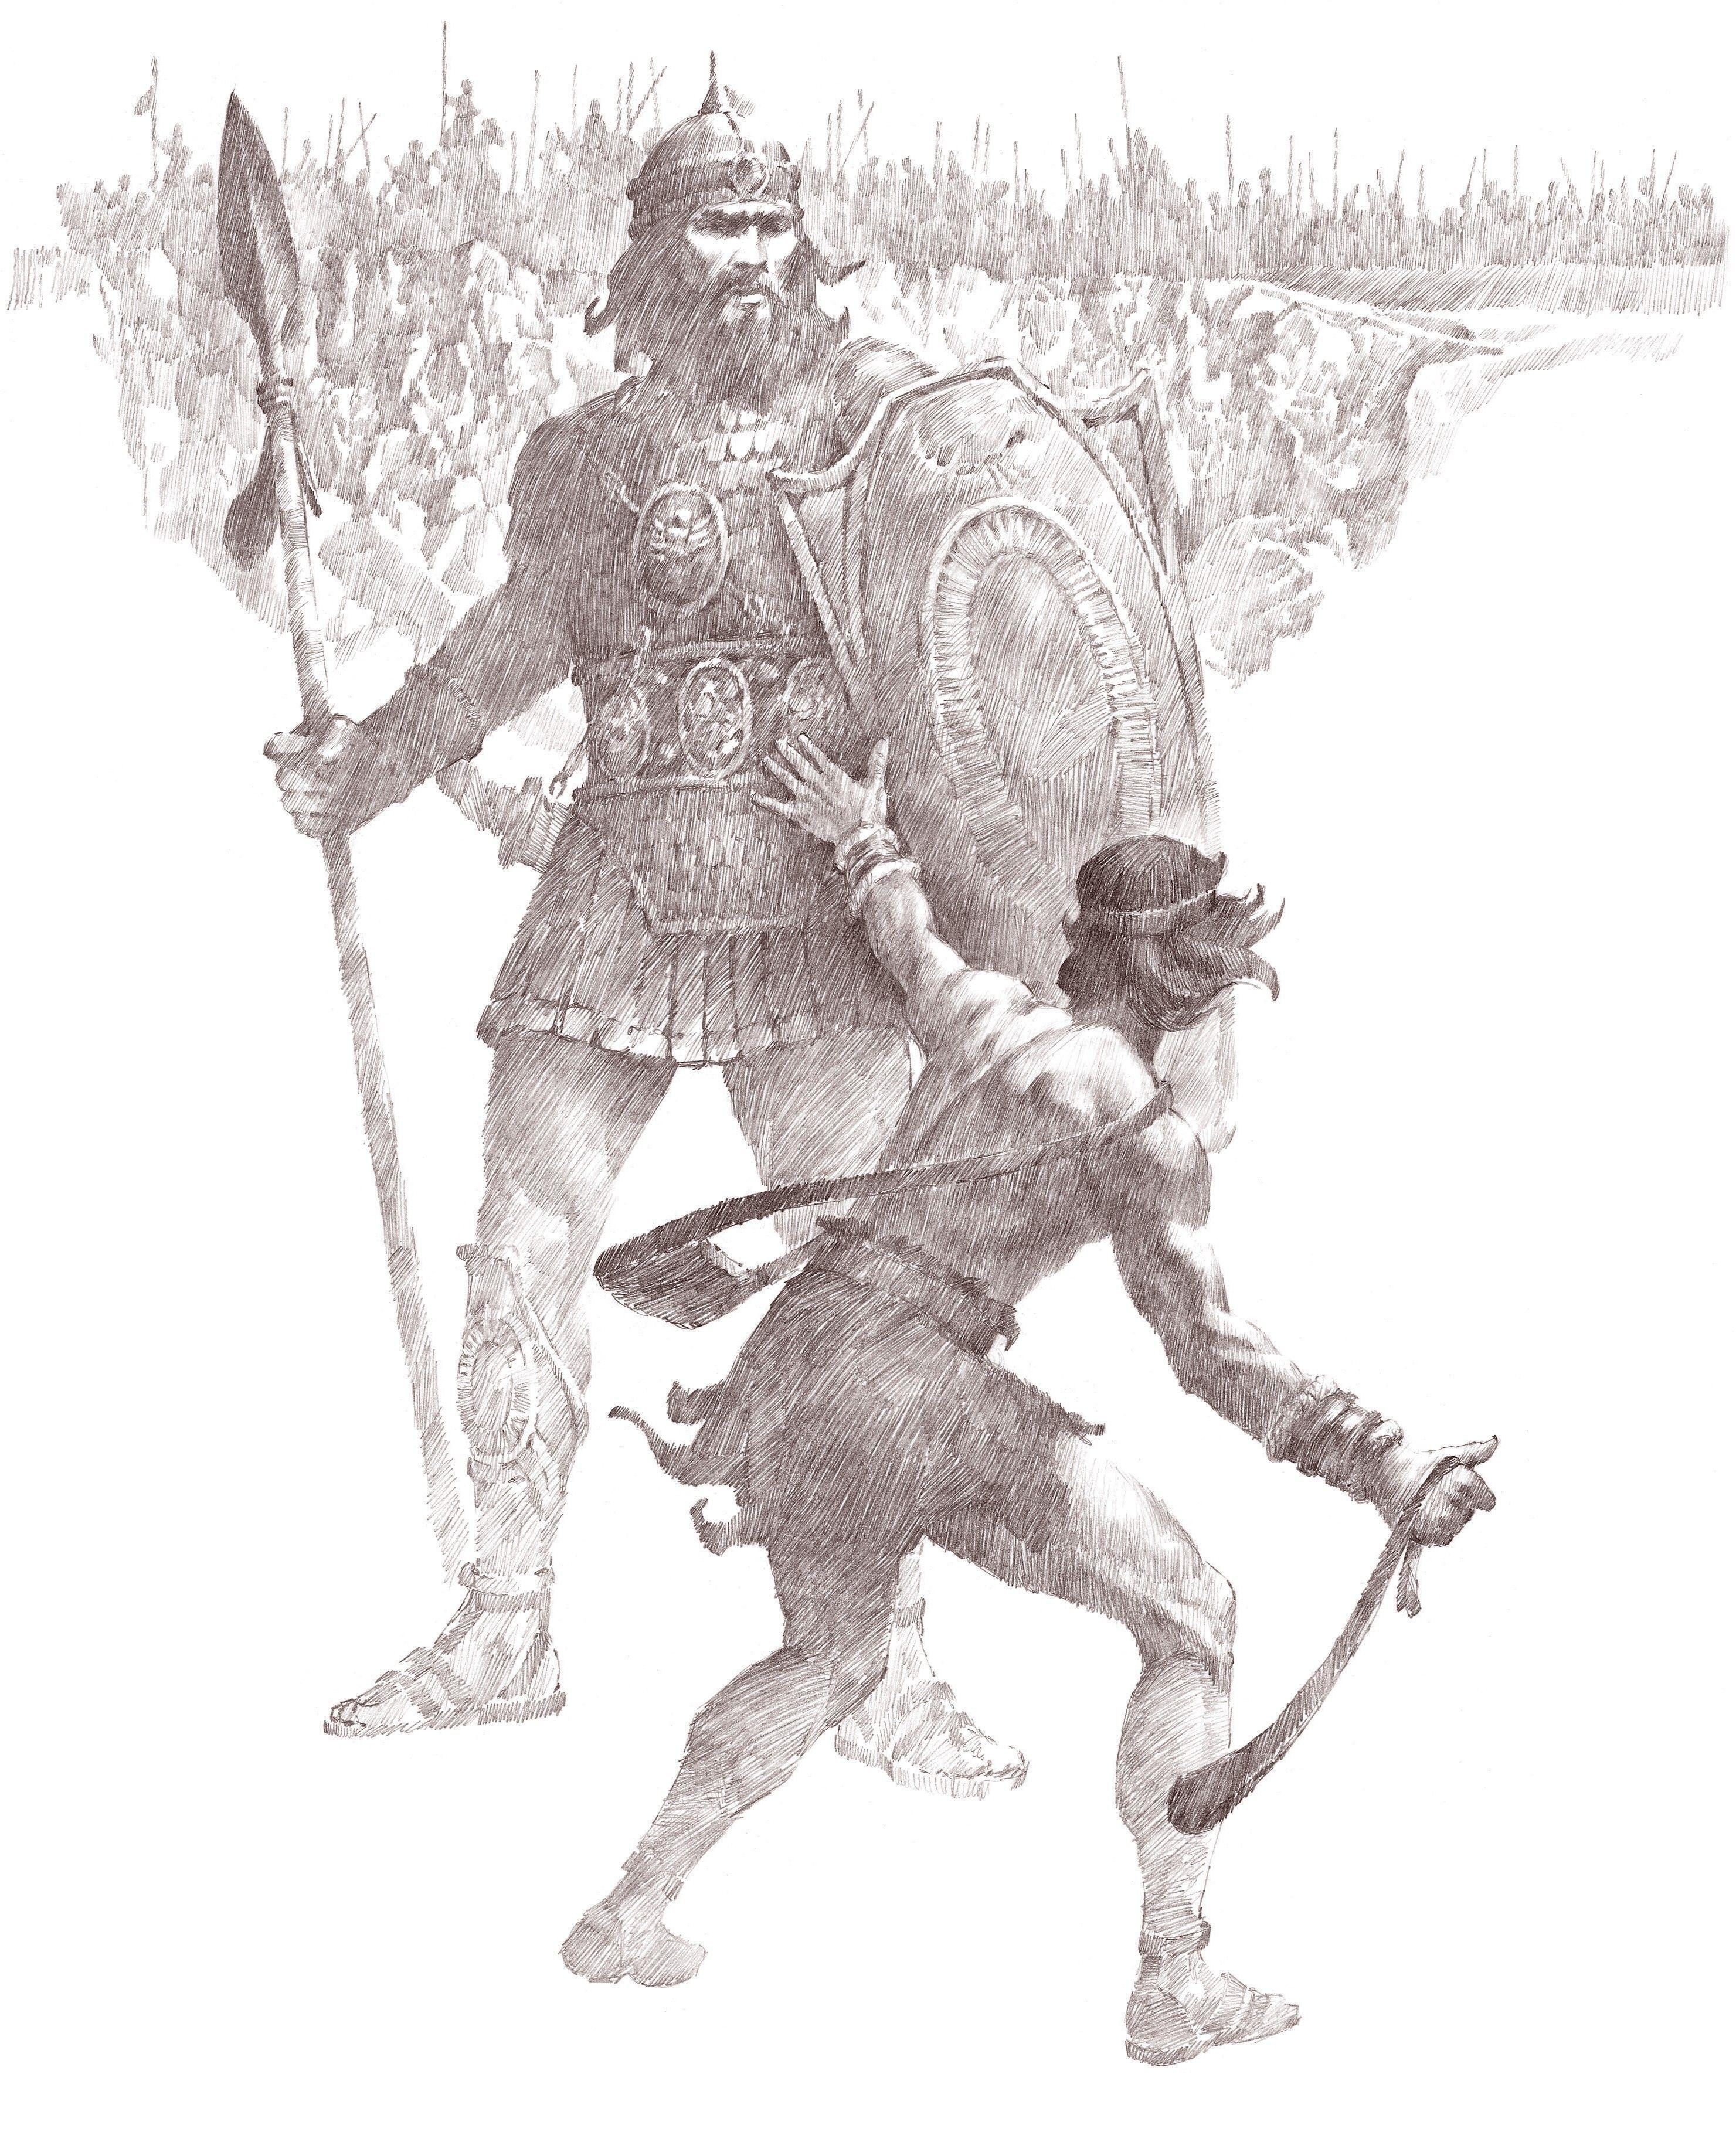 David Slays Goliath, by Ted Henninger (62073); GAK 112; GAB 19; Primary manual 1-52; Primary manual 6-37; 1 Samuel 17